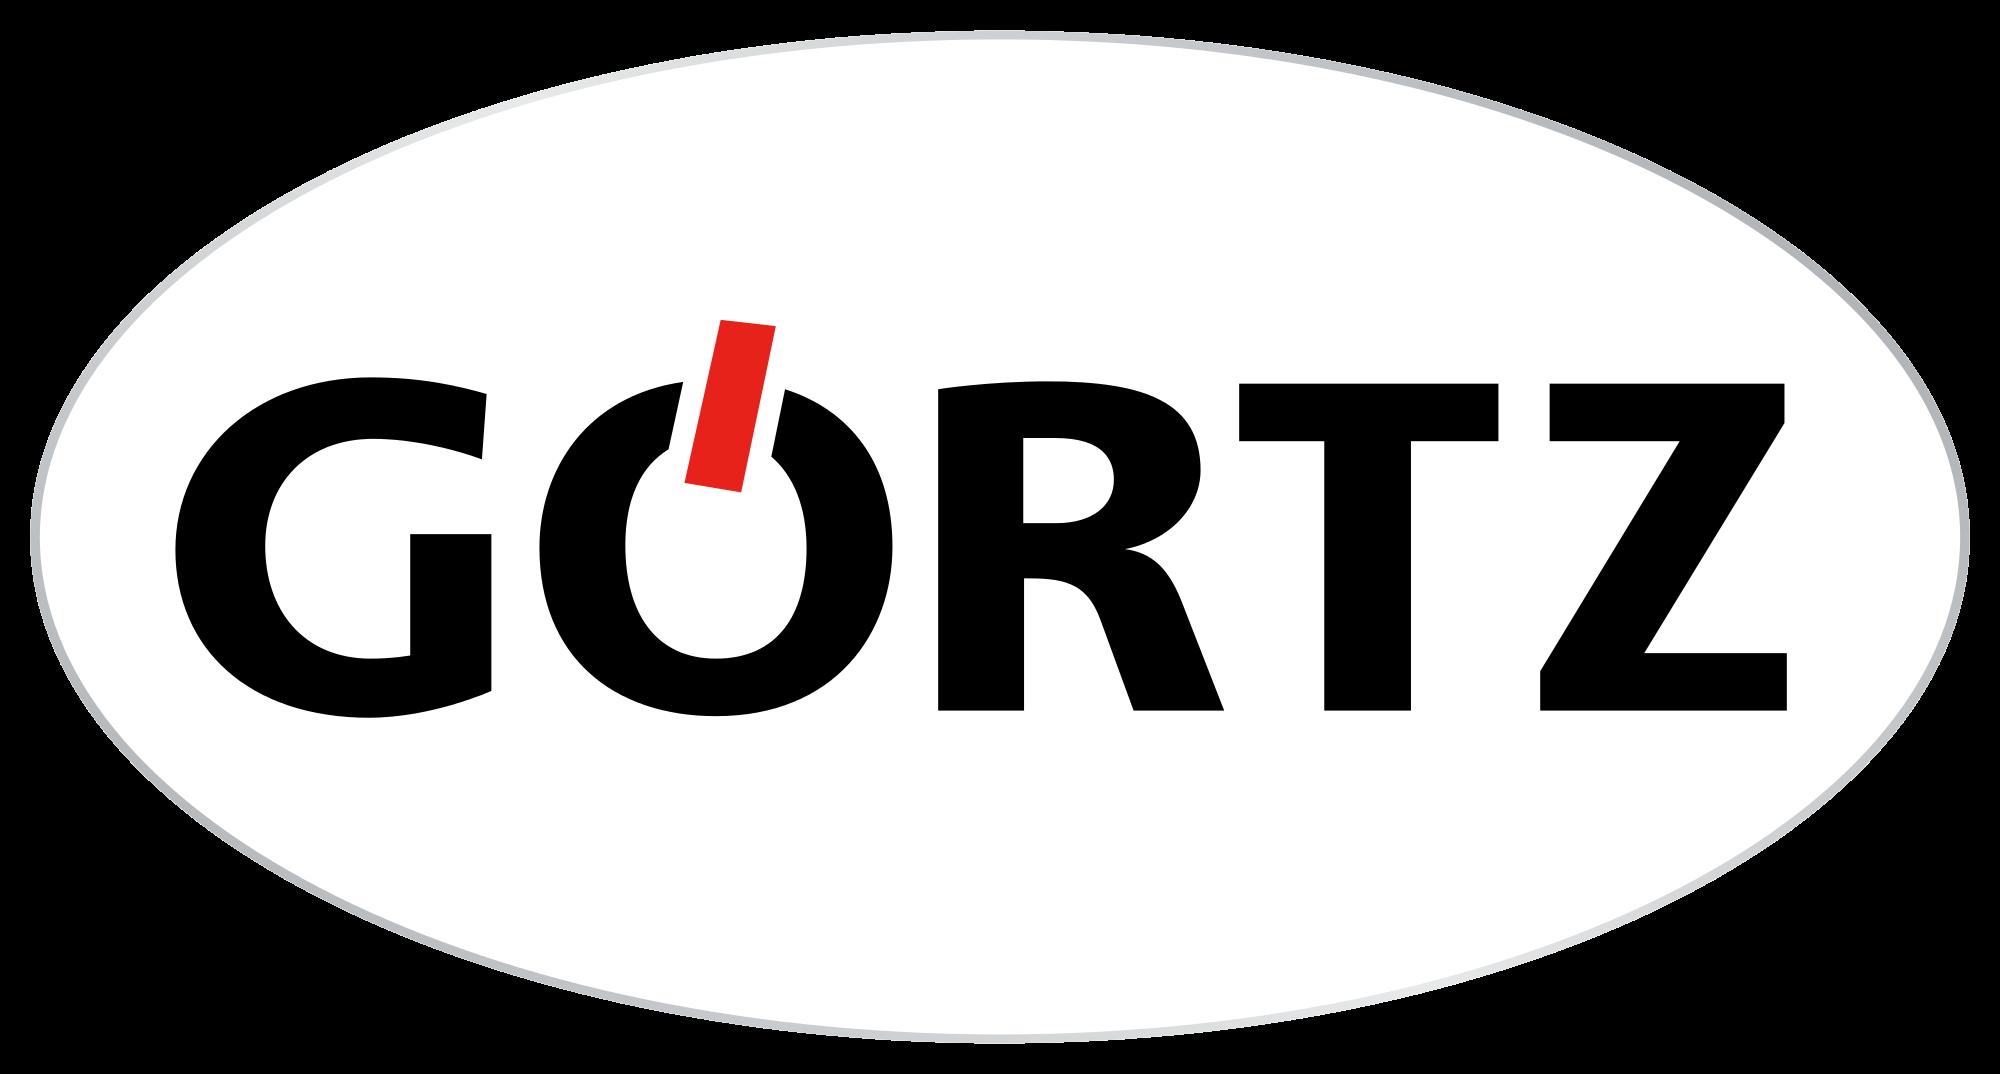 goertz.de Logo